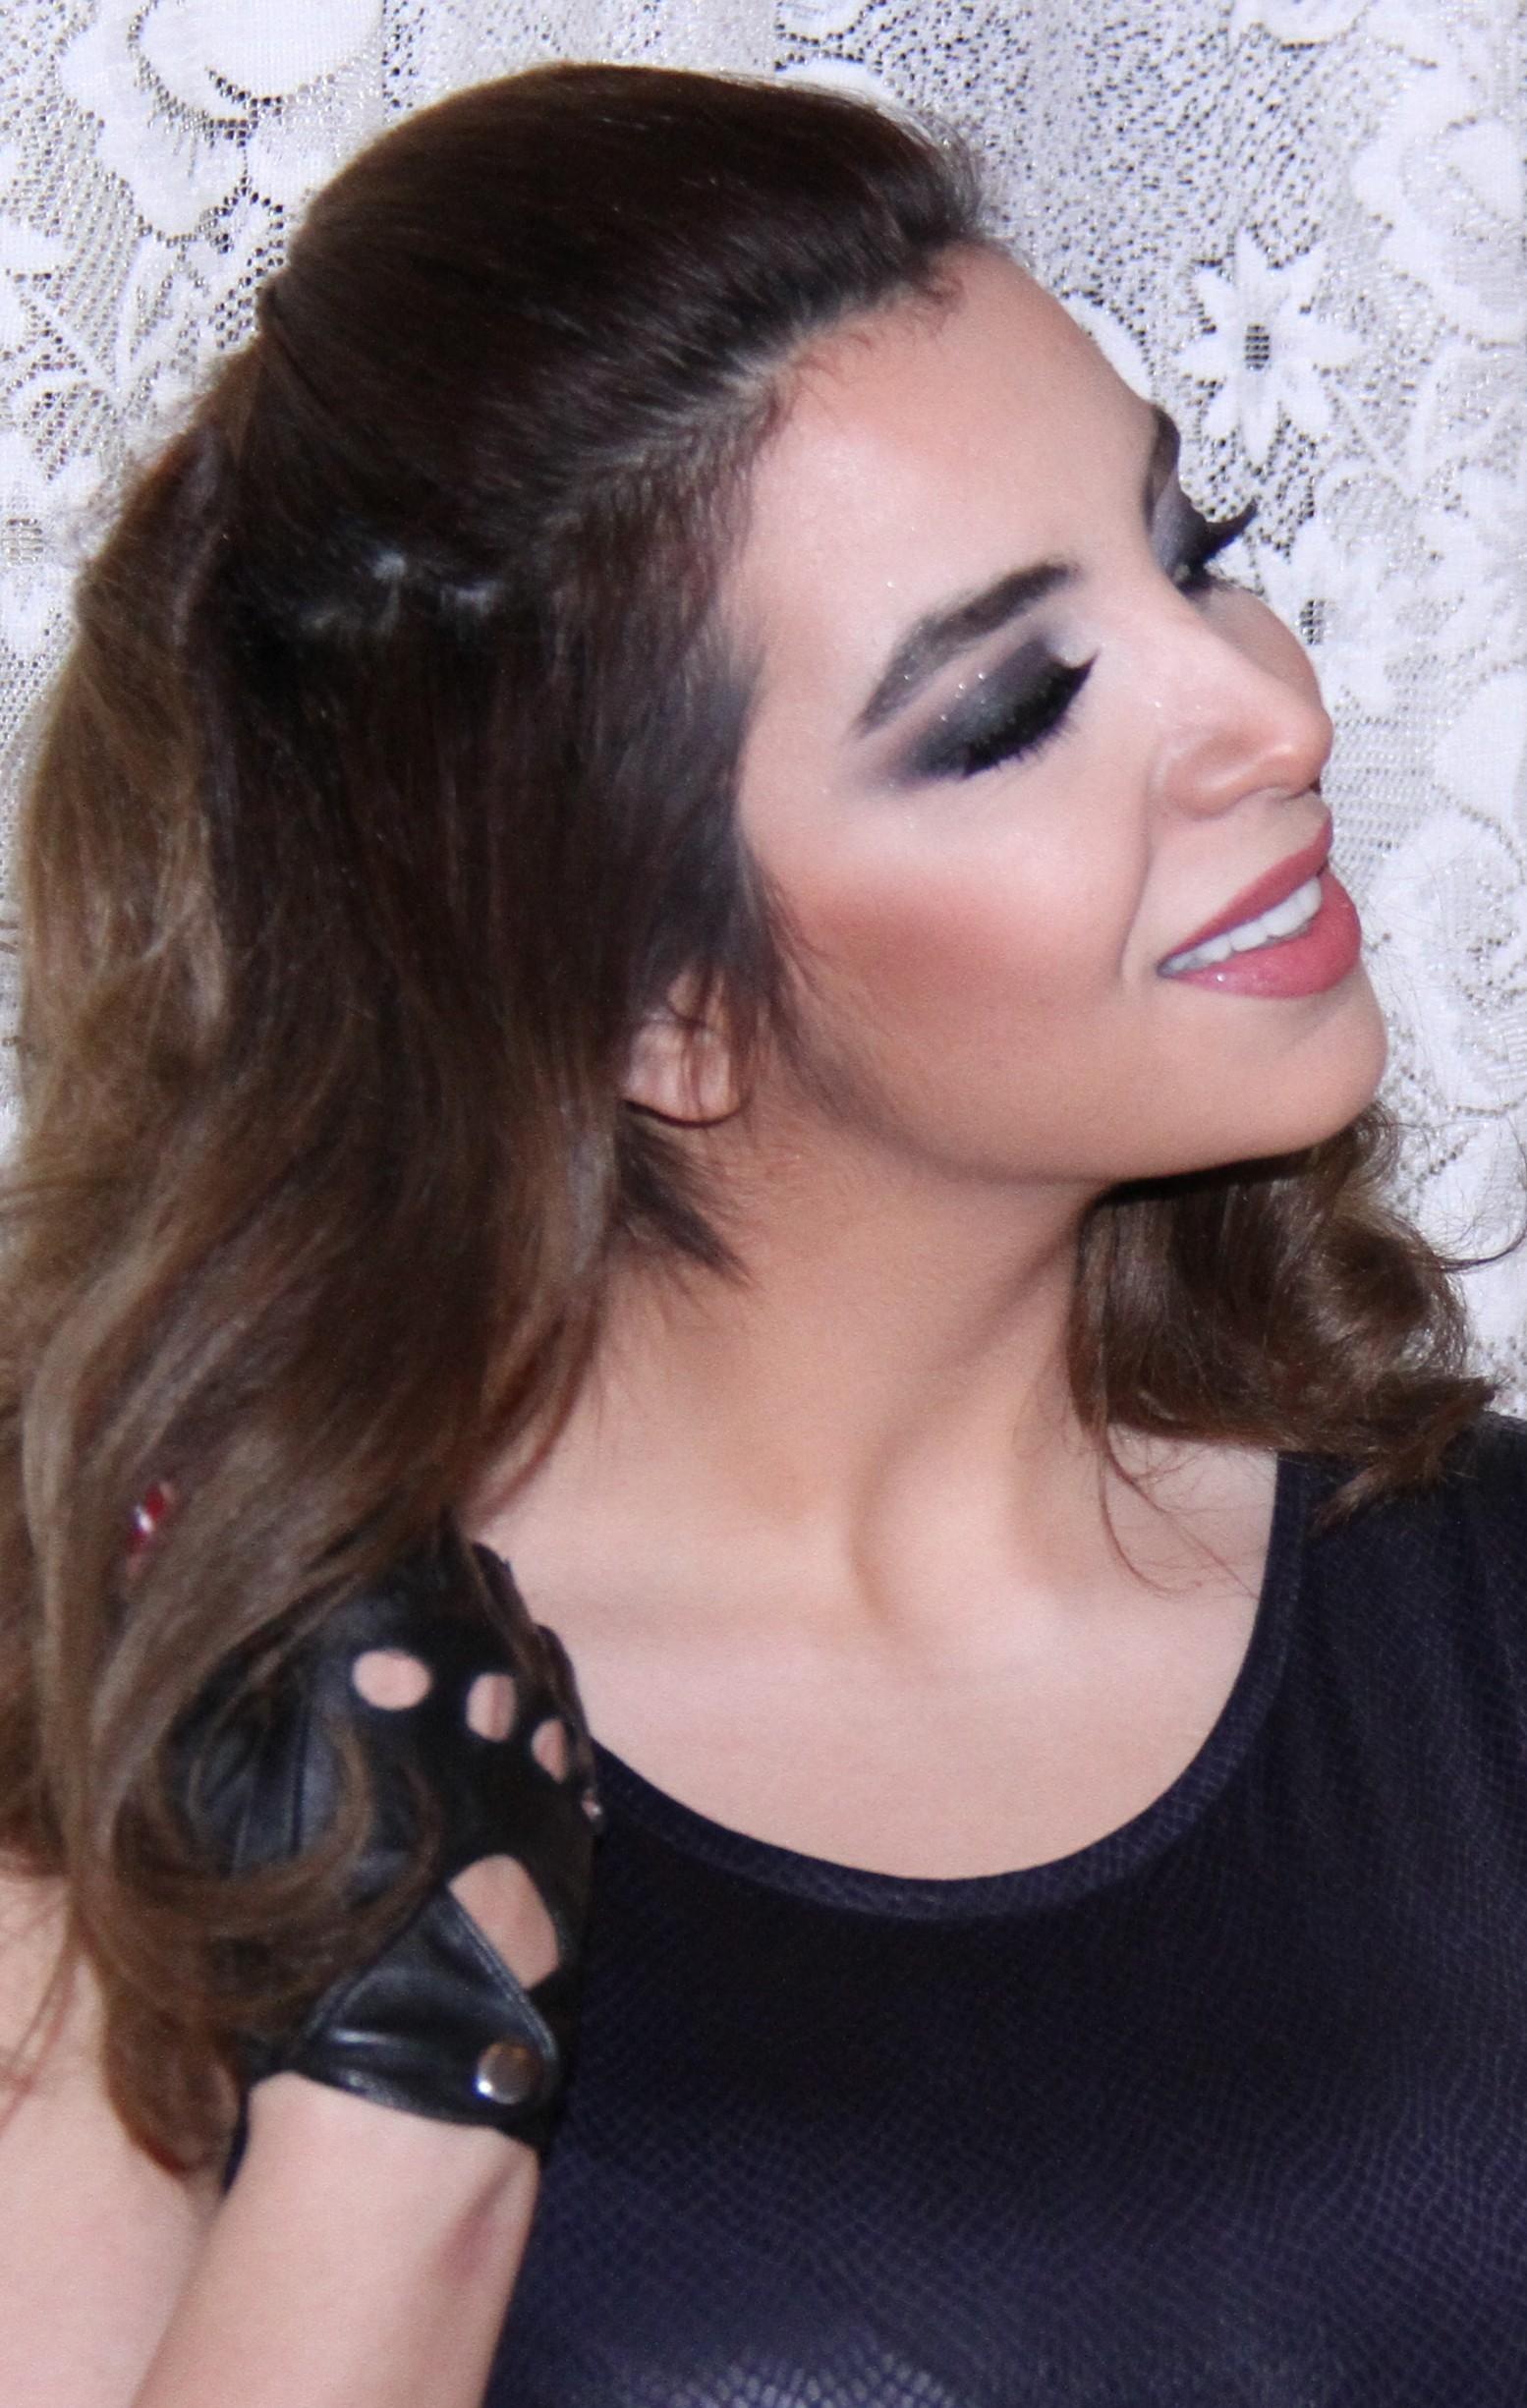 arab beauty influencers